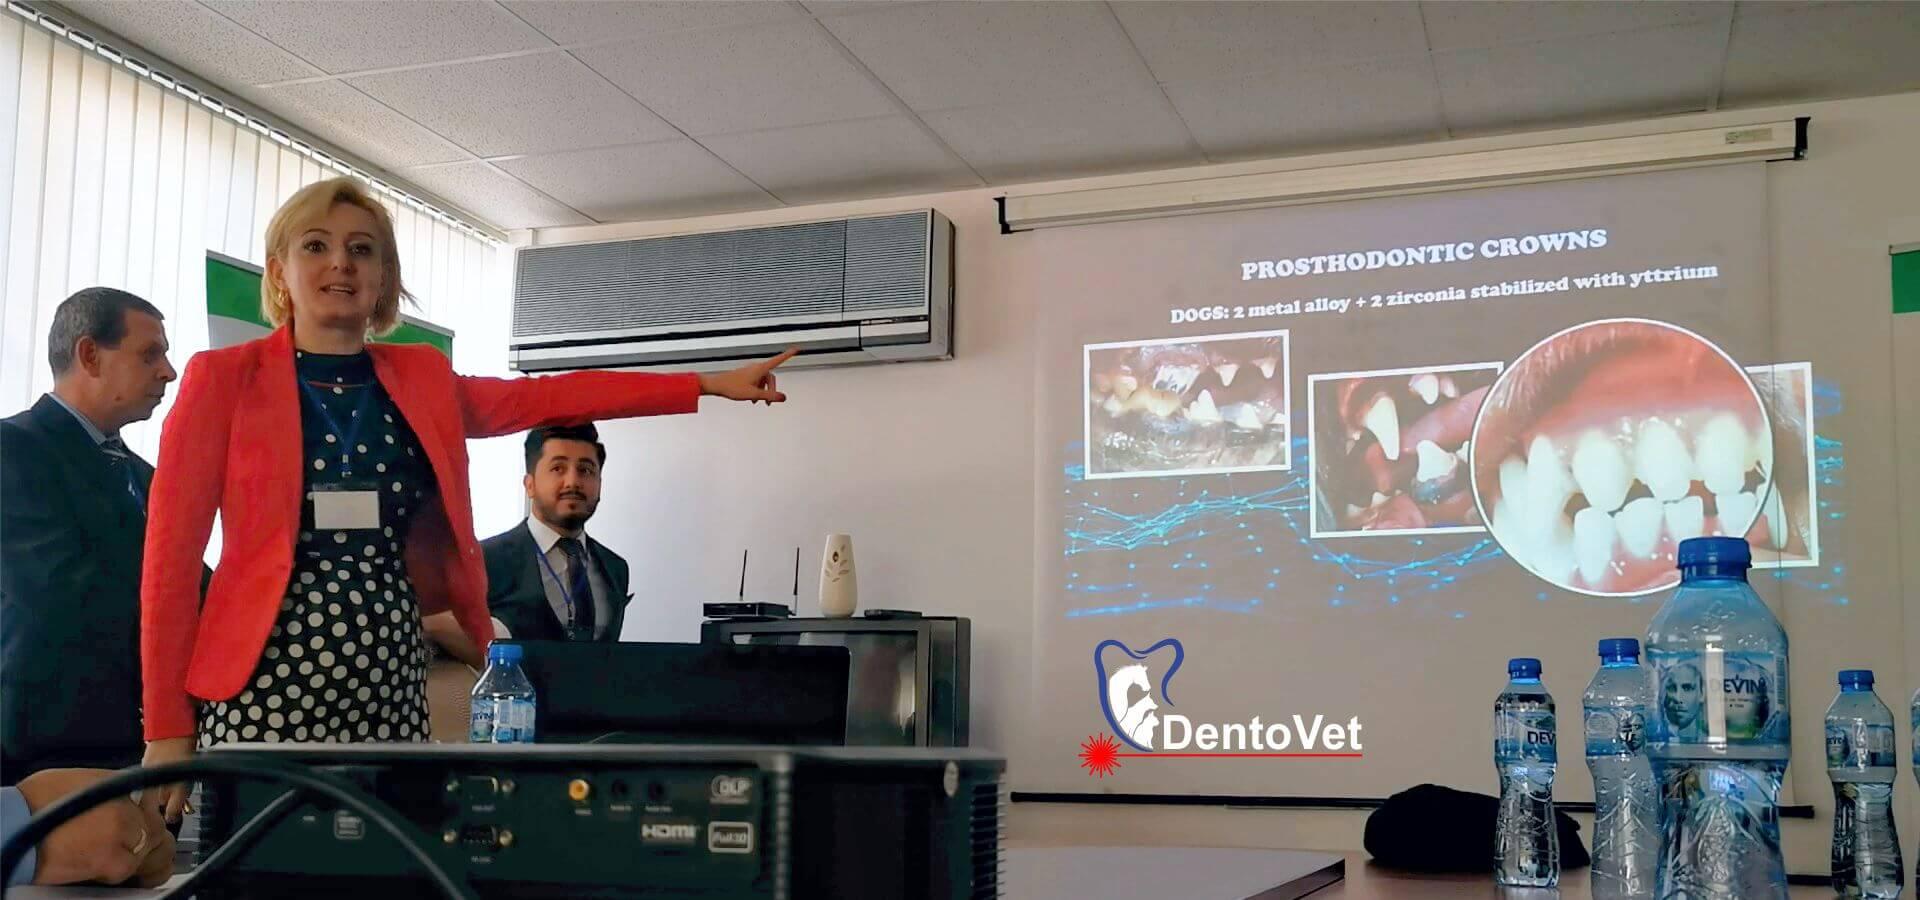 Stomatologie veterinară Dentovet la Stara Zagora